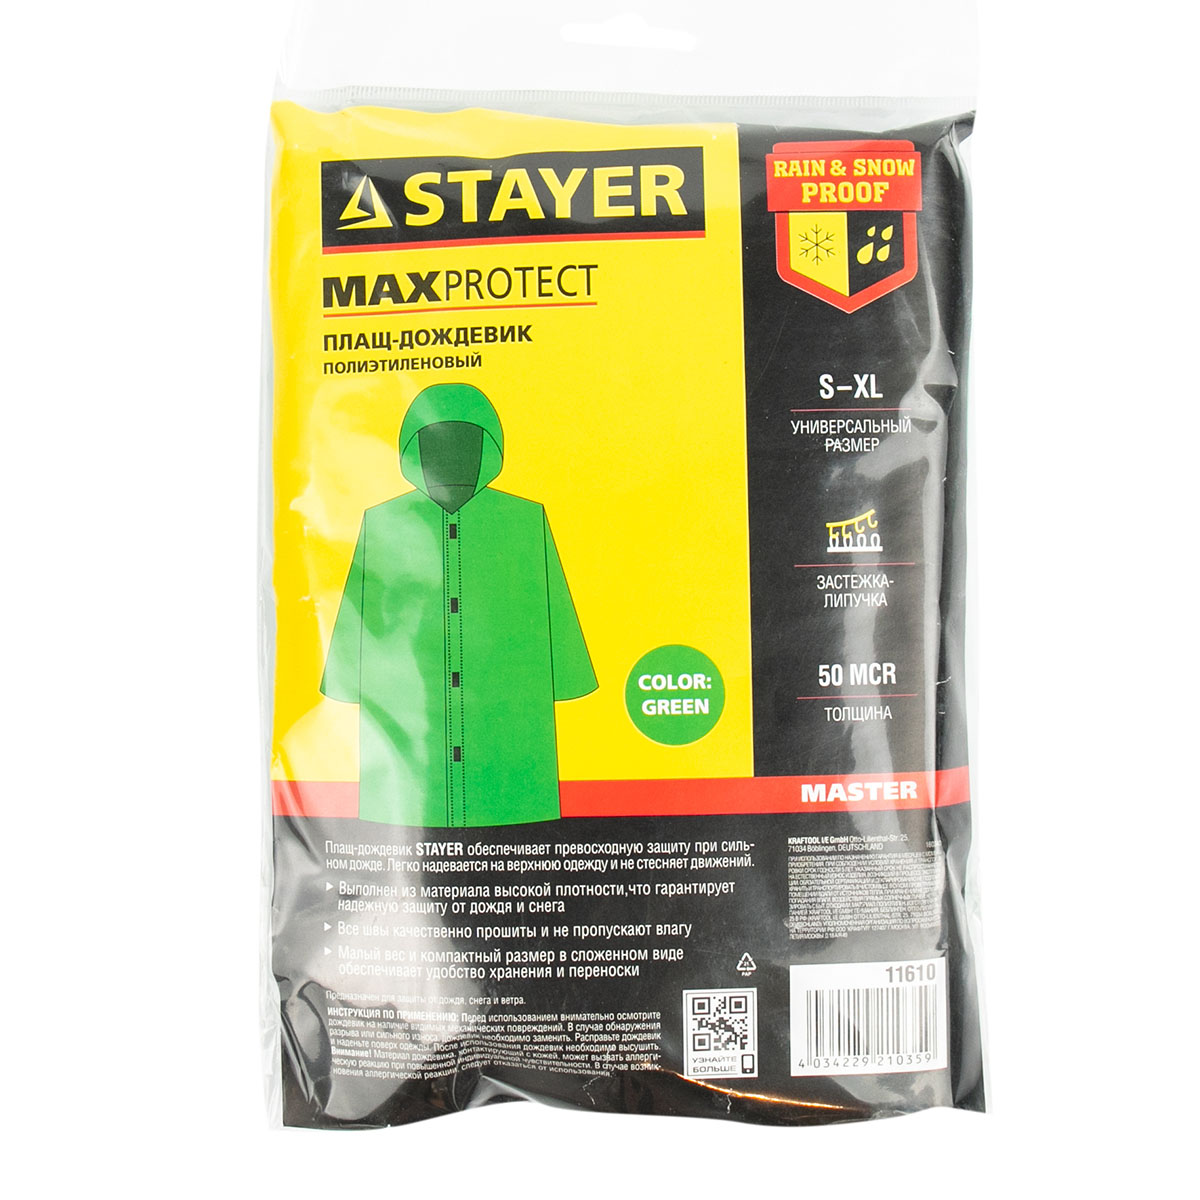 Stayer зеленый дождевик S-XL